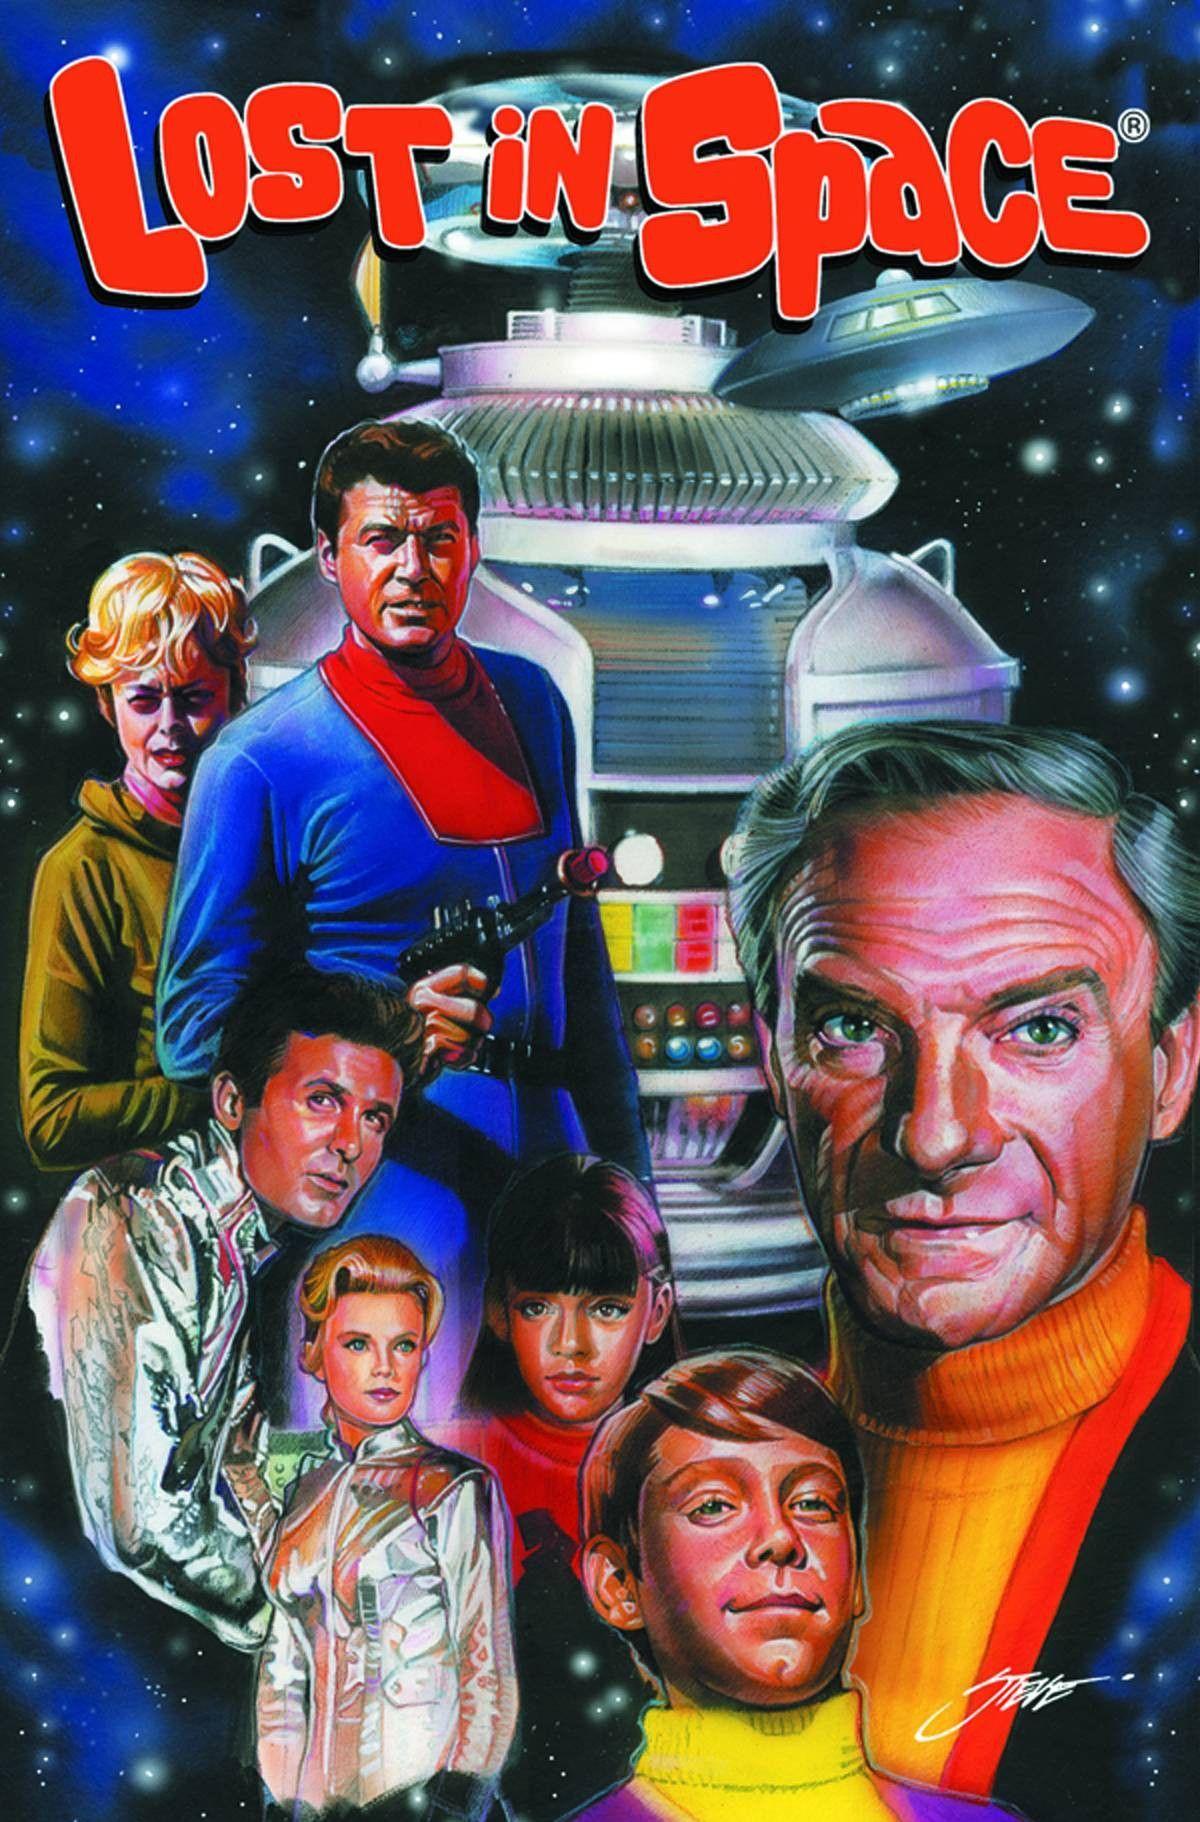 Irwin Allen S Legendary Sci Fi Property Returns Before